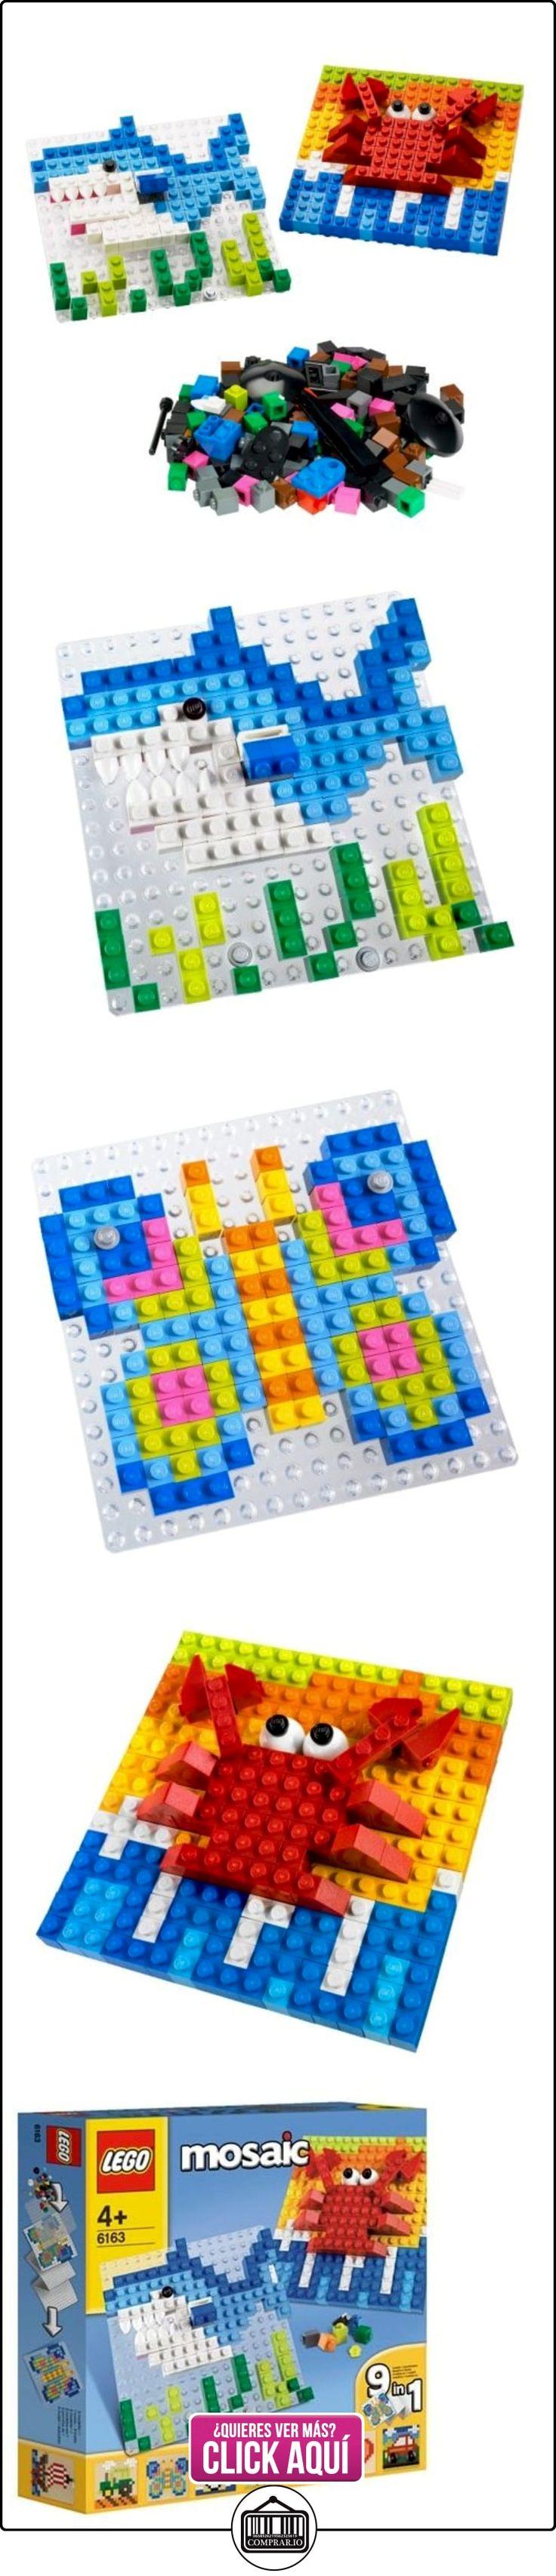 1000 ideas about lego creative on pinterest lego ideas for Creative lego ideas